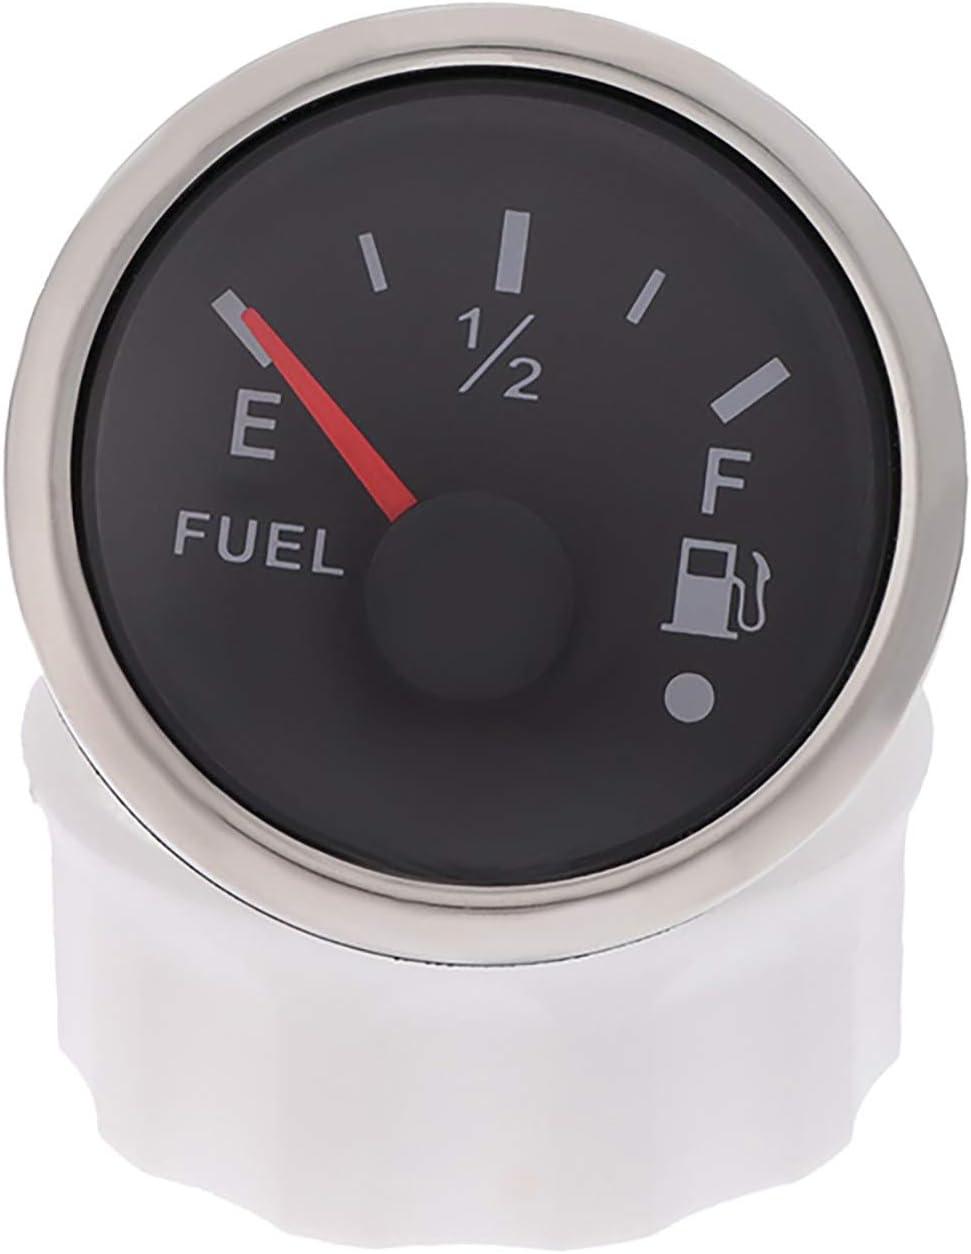 240-33 ohm Fuel Level Gauge Waterproof Fuel Level Indicator Fit ...